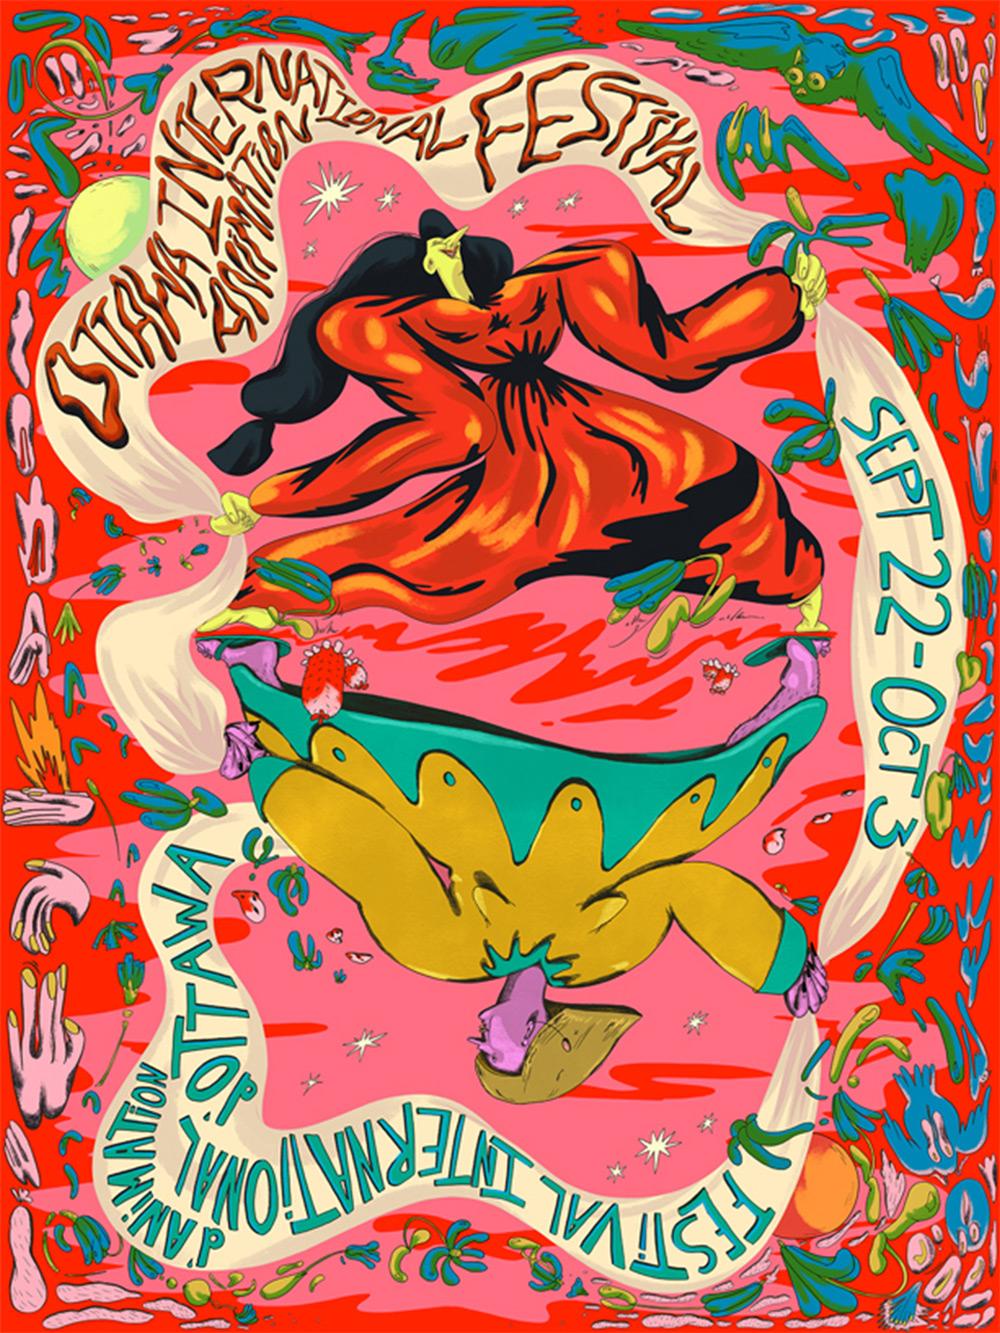 OIAF 2021 official poster designed by Angela Stempel & Amanda Bonaiuto.